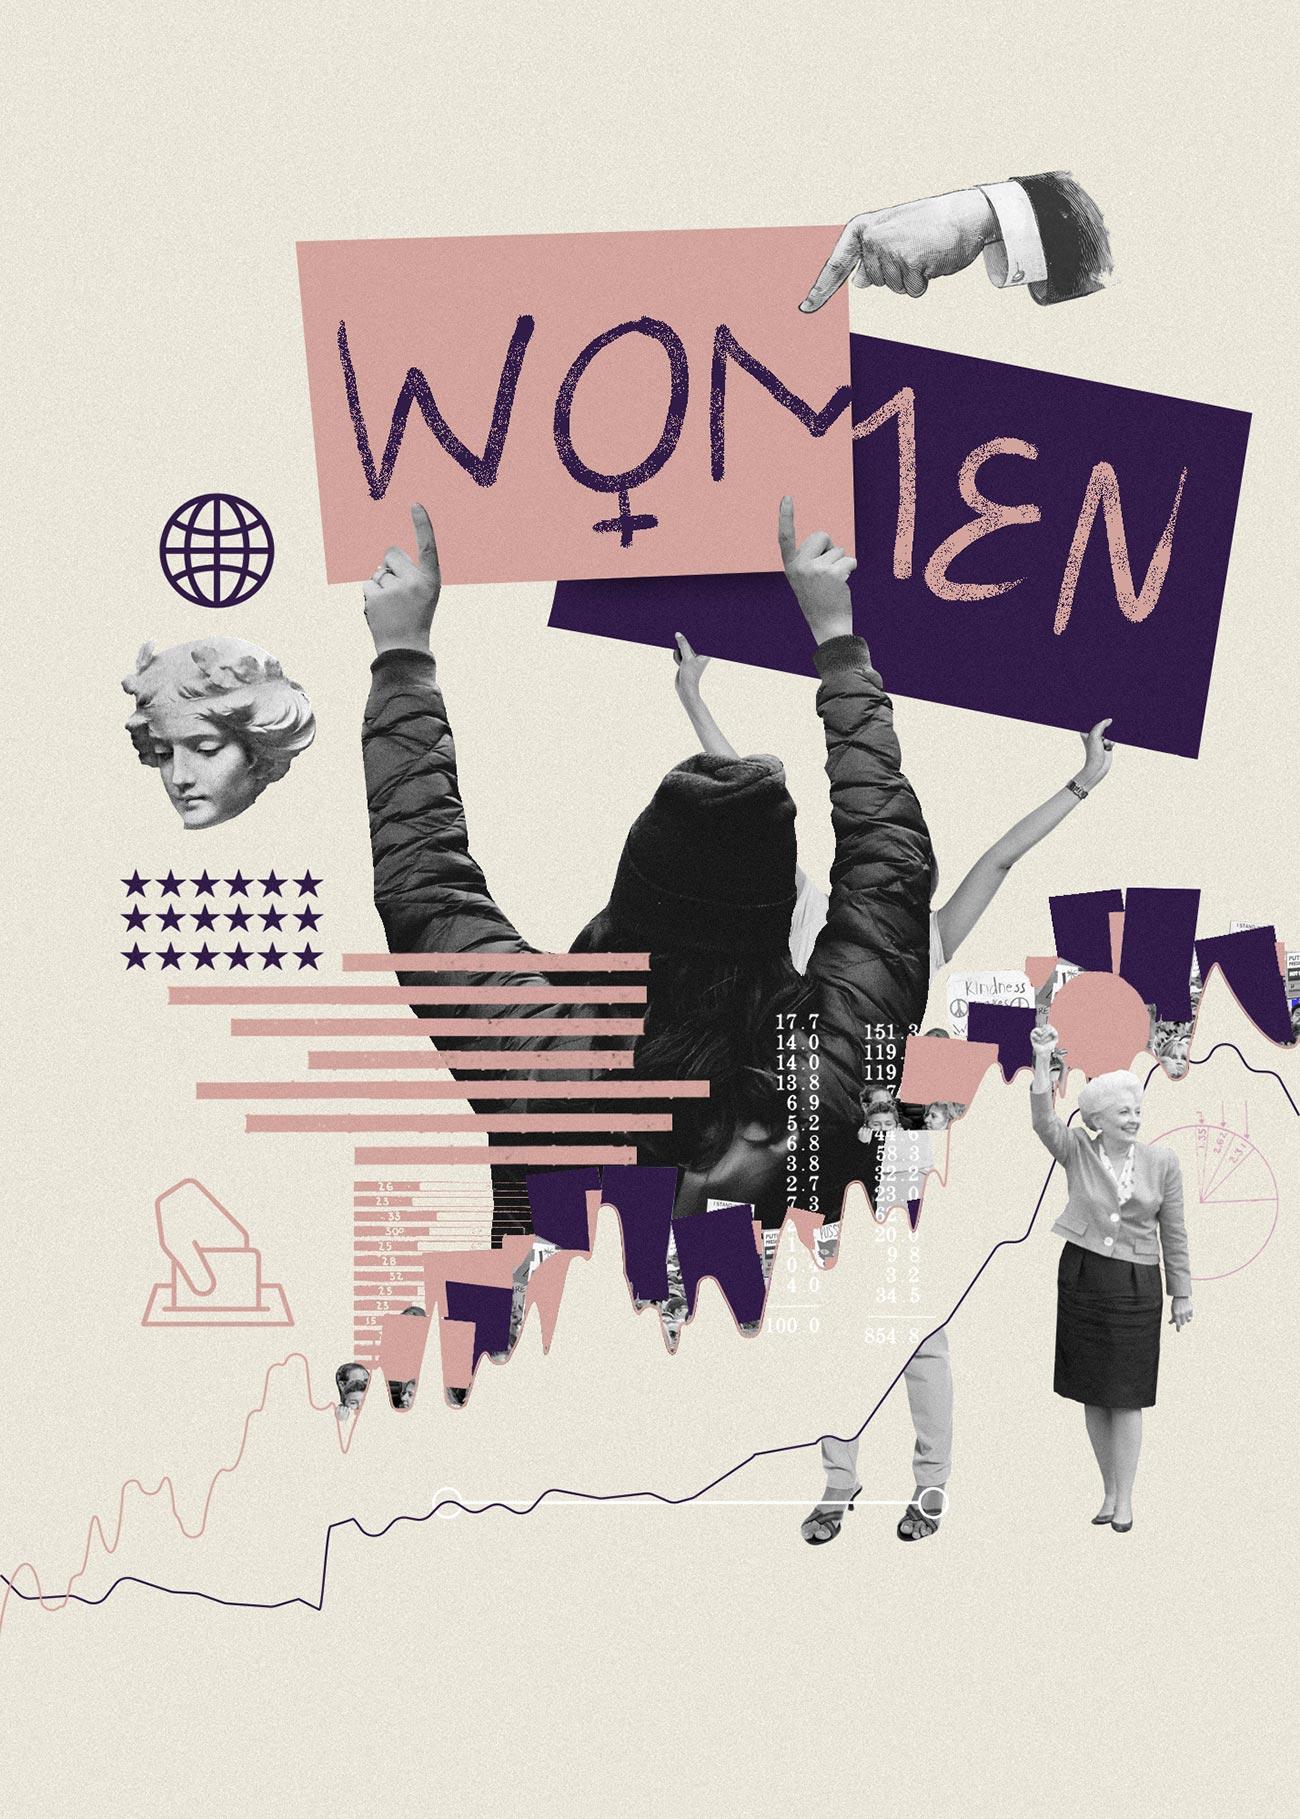 TM-Maxmatic-Women-Politics_Final.jpg